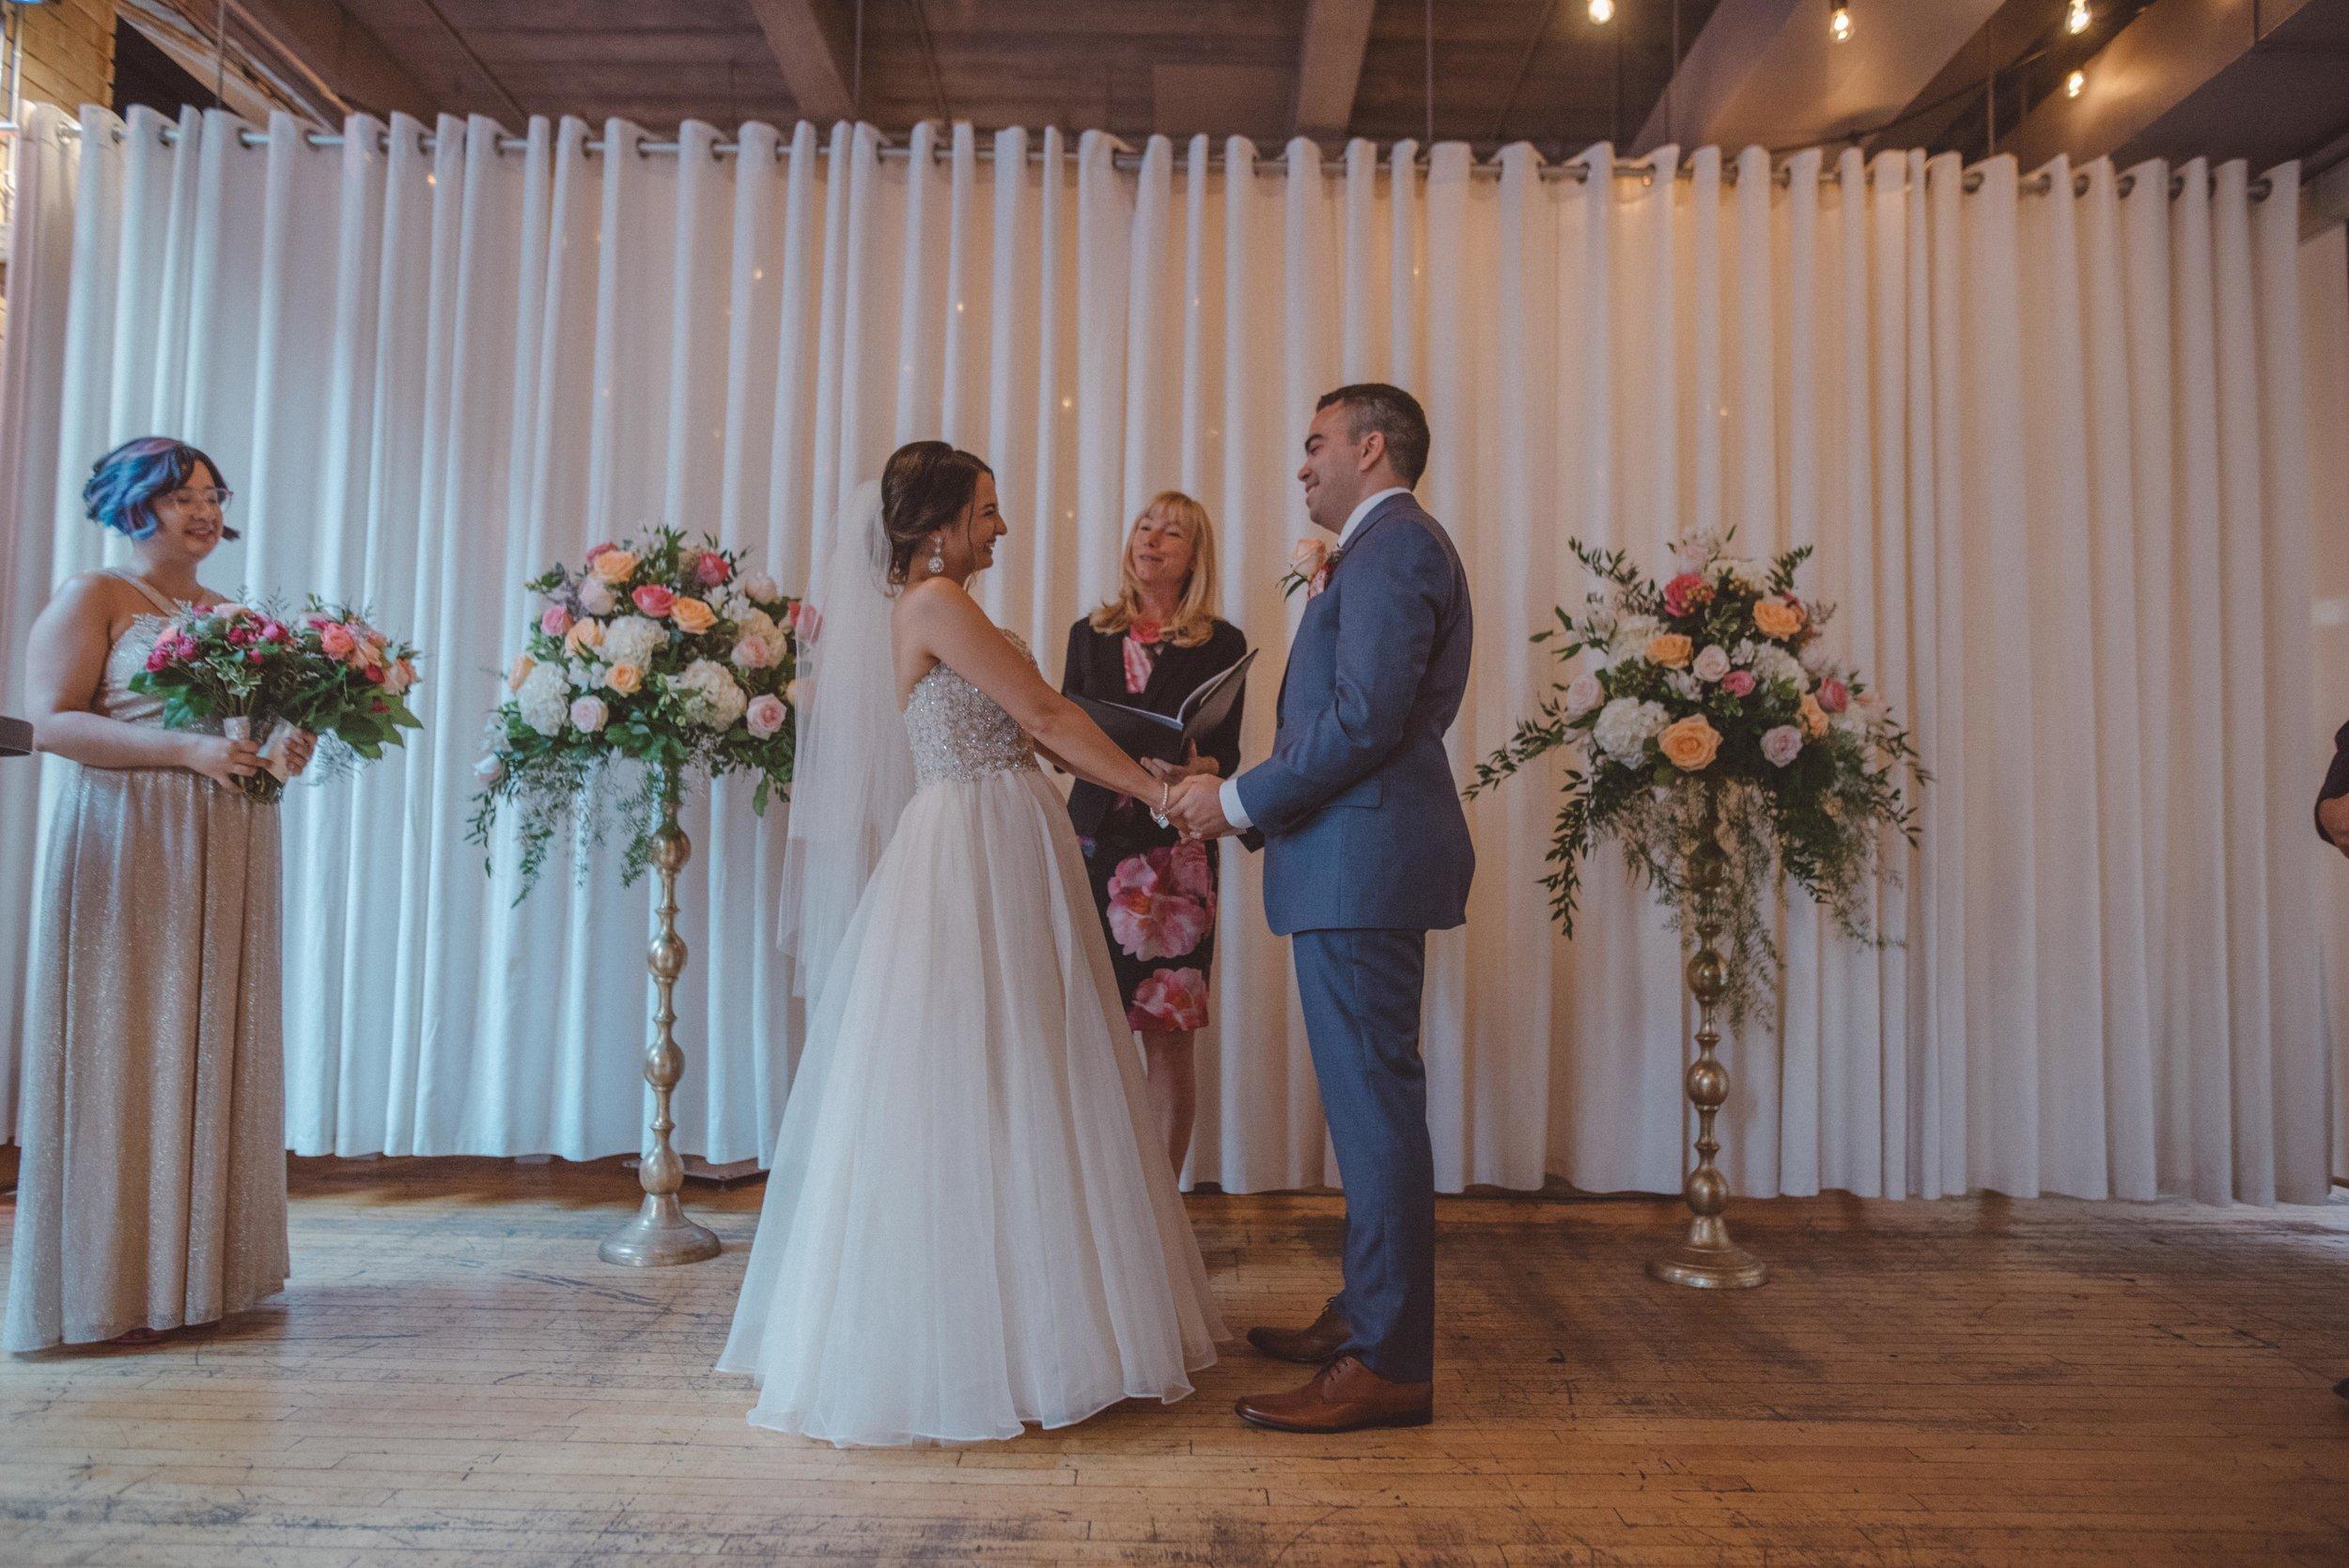 mariage_photographe_toronto_gatineau_ottawa_photographer_wedding-39.jpg